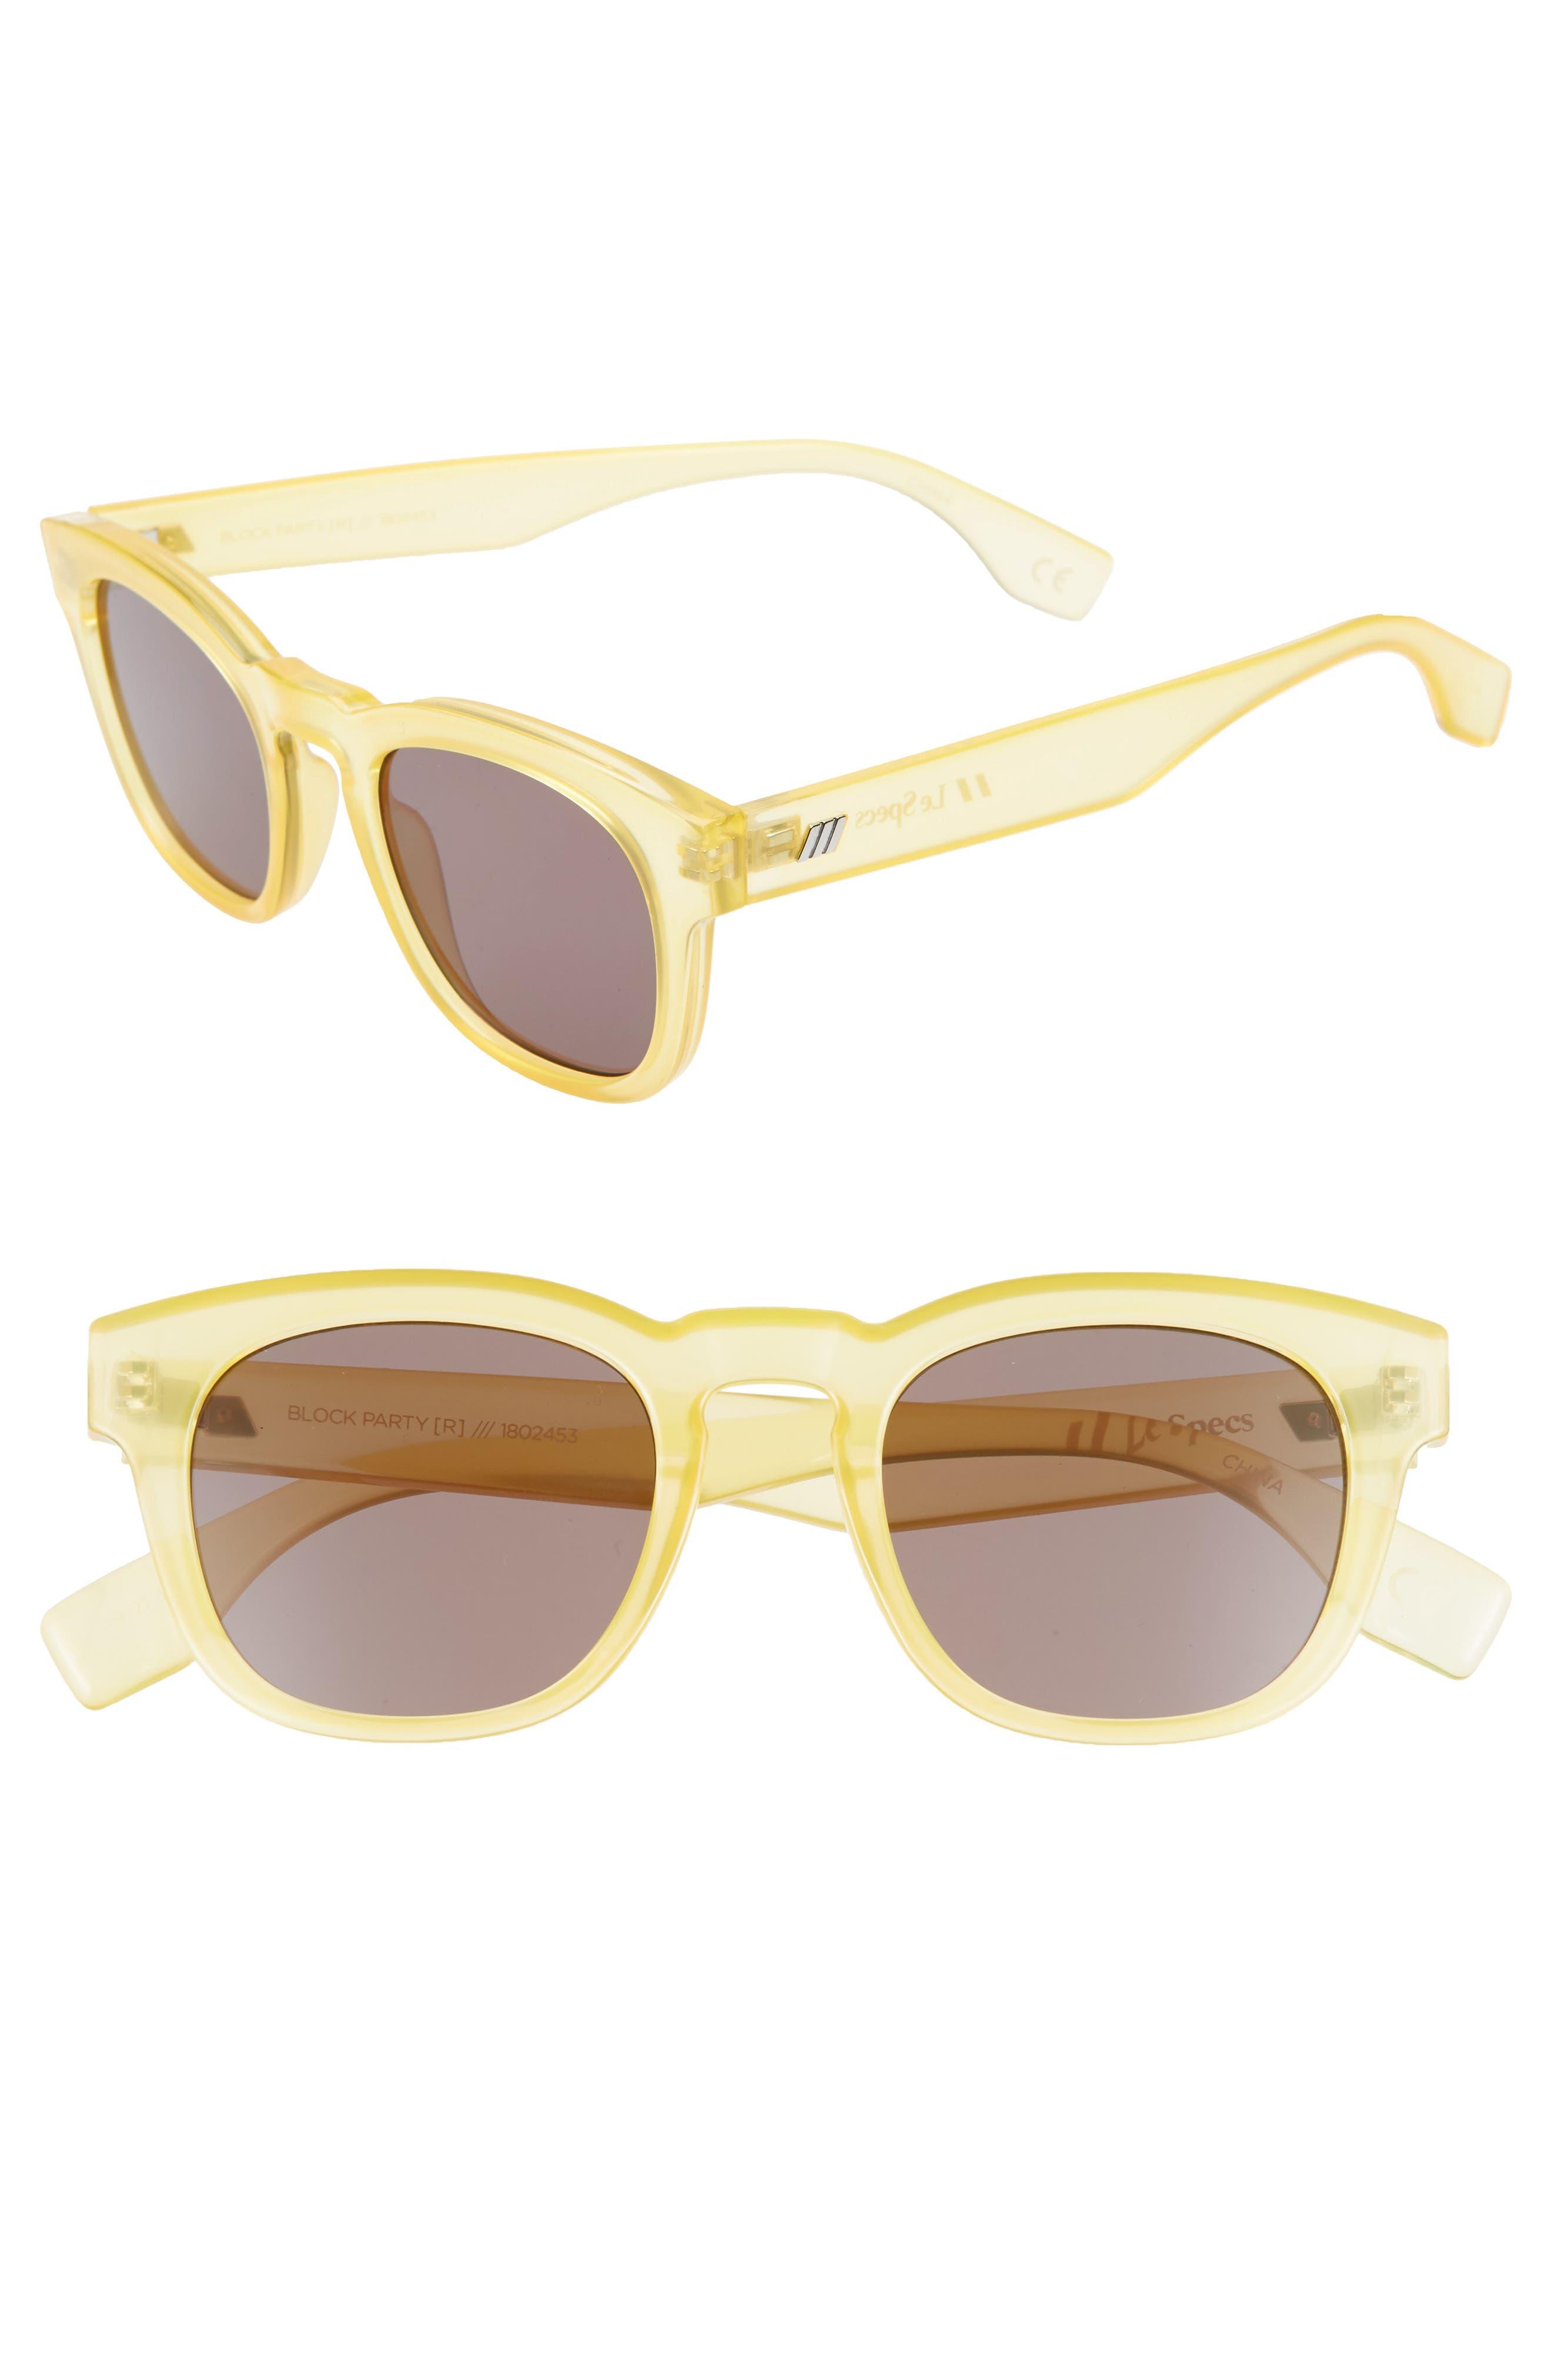 Le Specs Block Party 4m Round Sunglasses - Amber